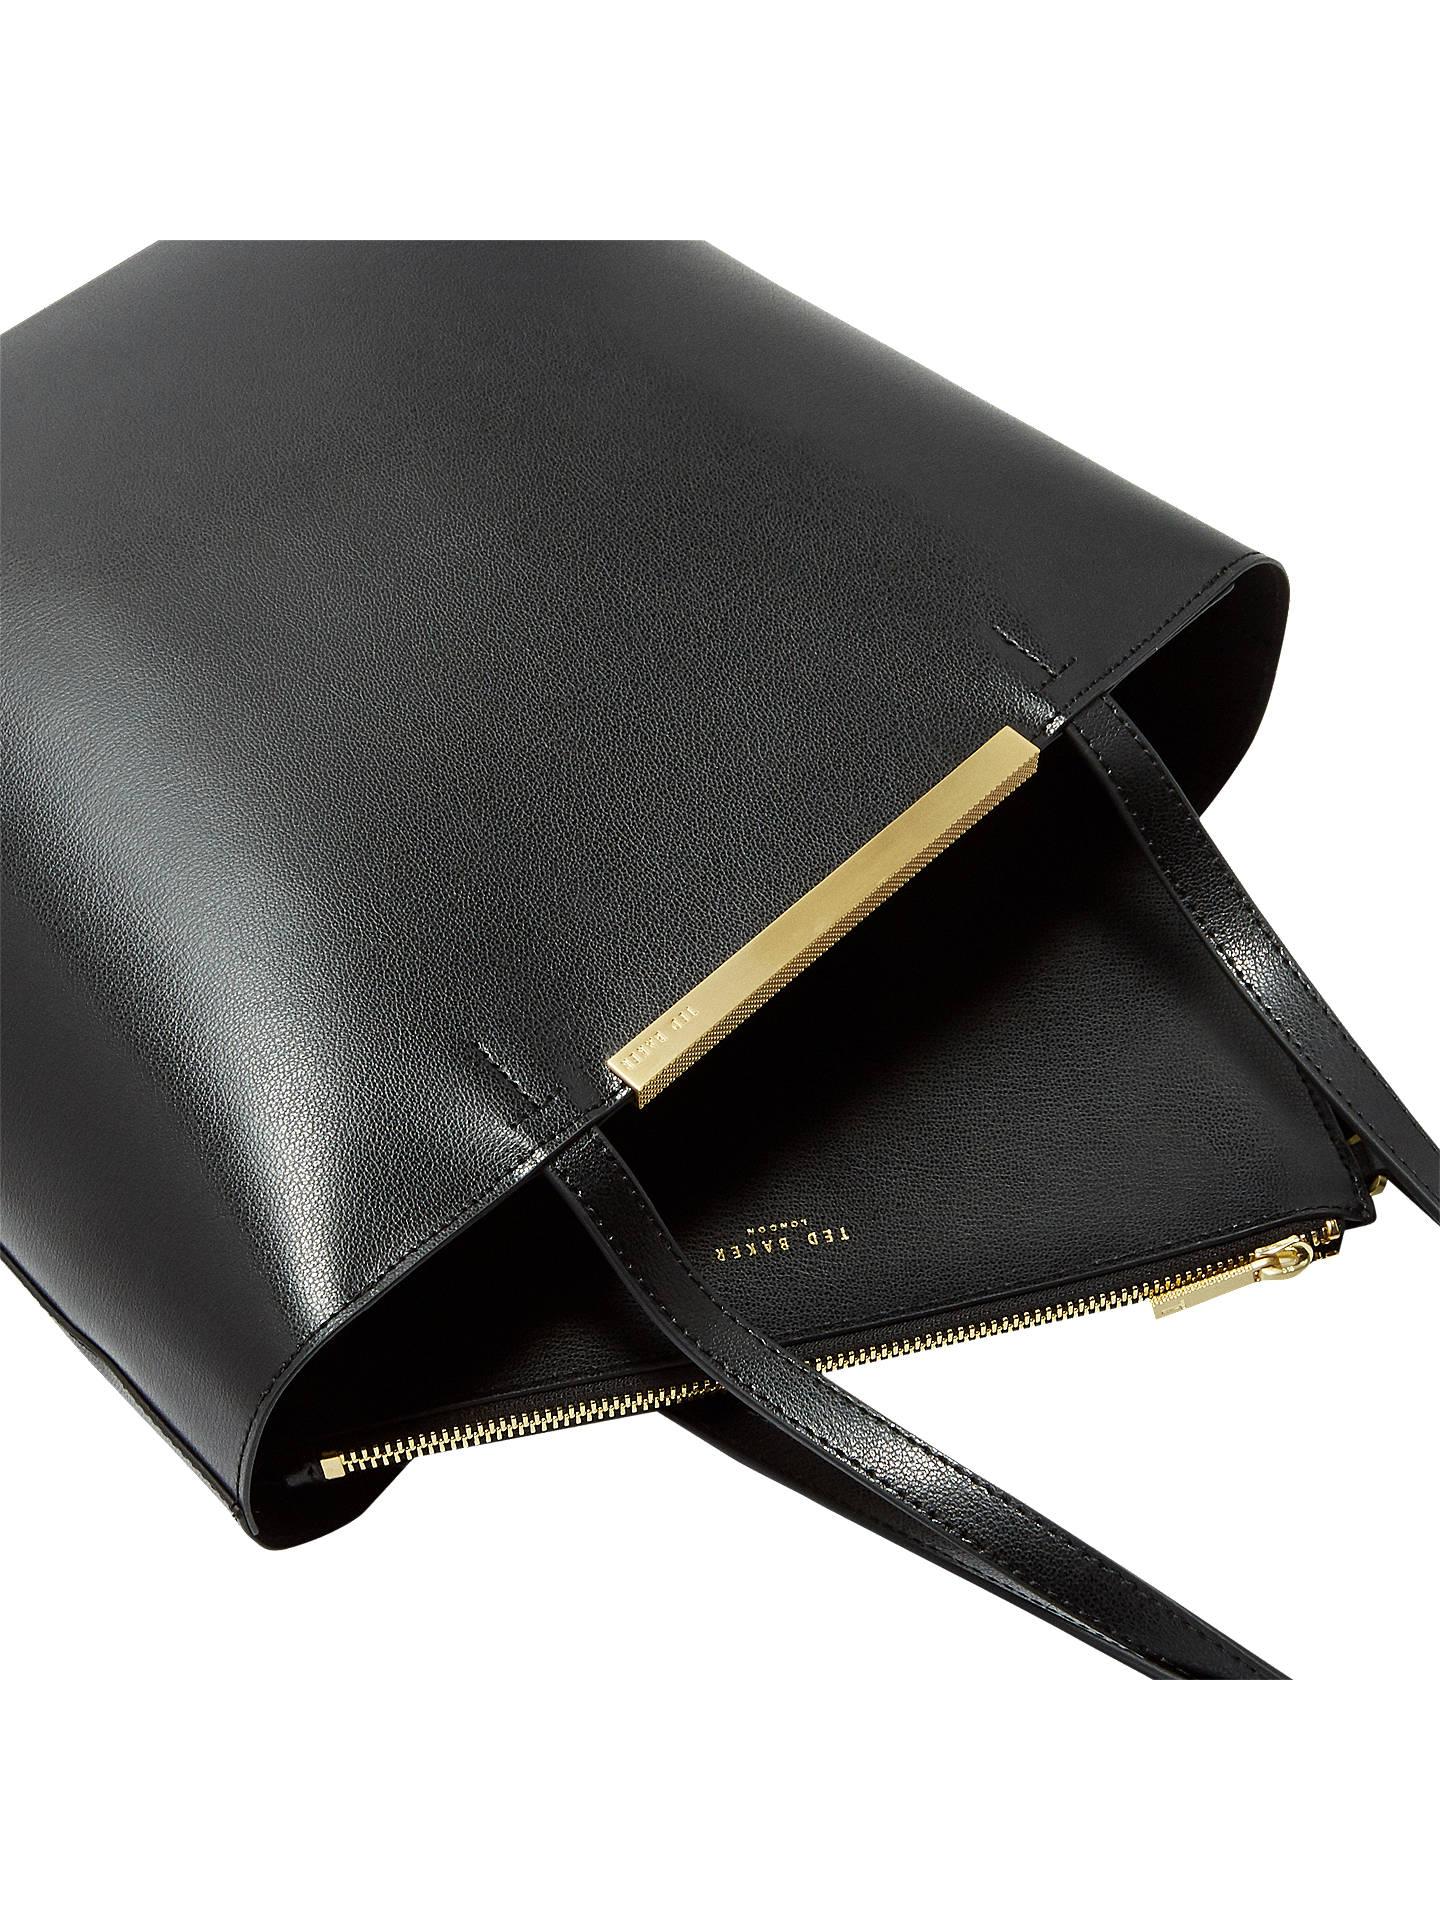 c7bb949232ccfc Ted Baker Melisa Large Leather Tote Bag at John Lewis   Partners